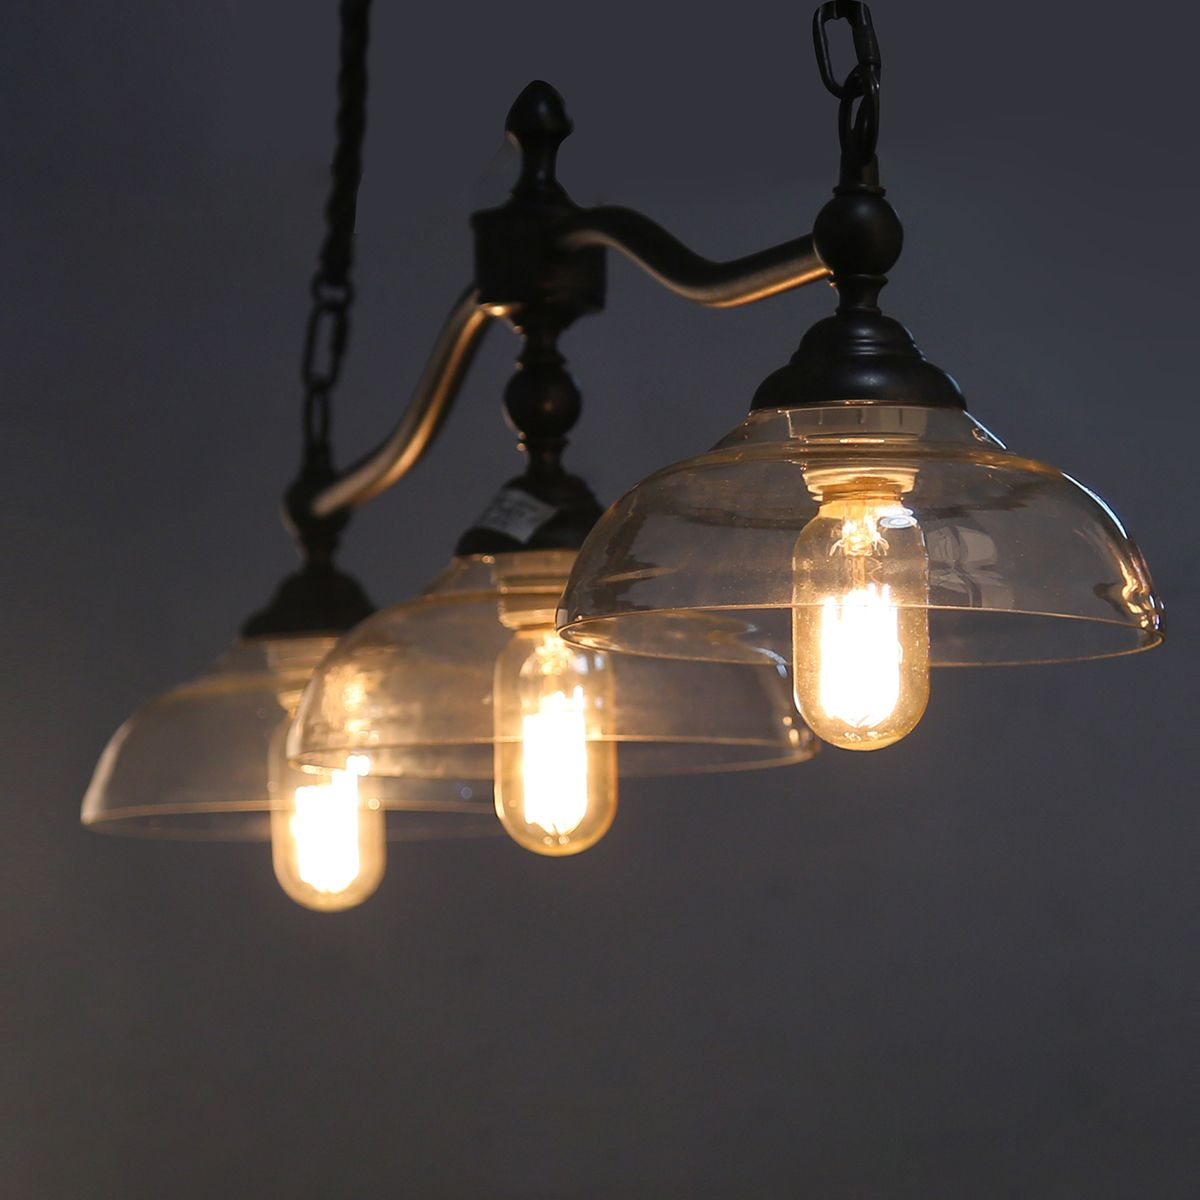 LOG BARN Light Linear Kitchen Island Lighting Billiard Lights - Linear kitchen island lighting